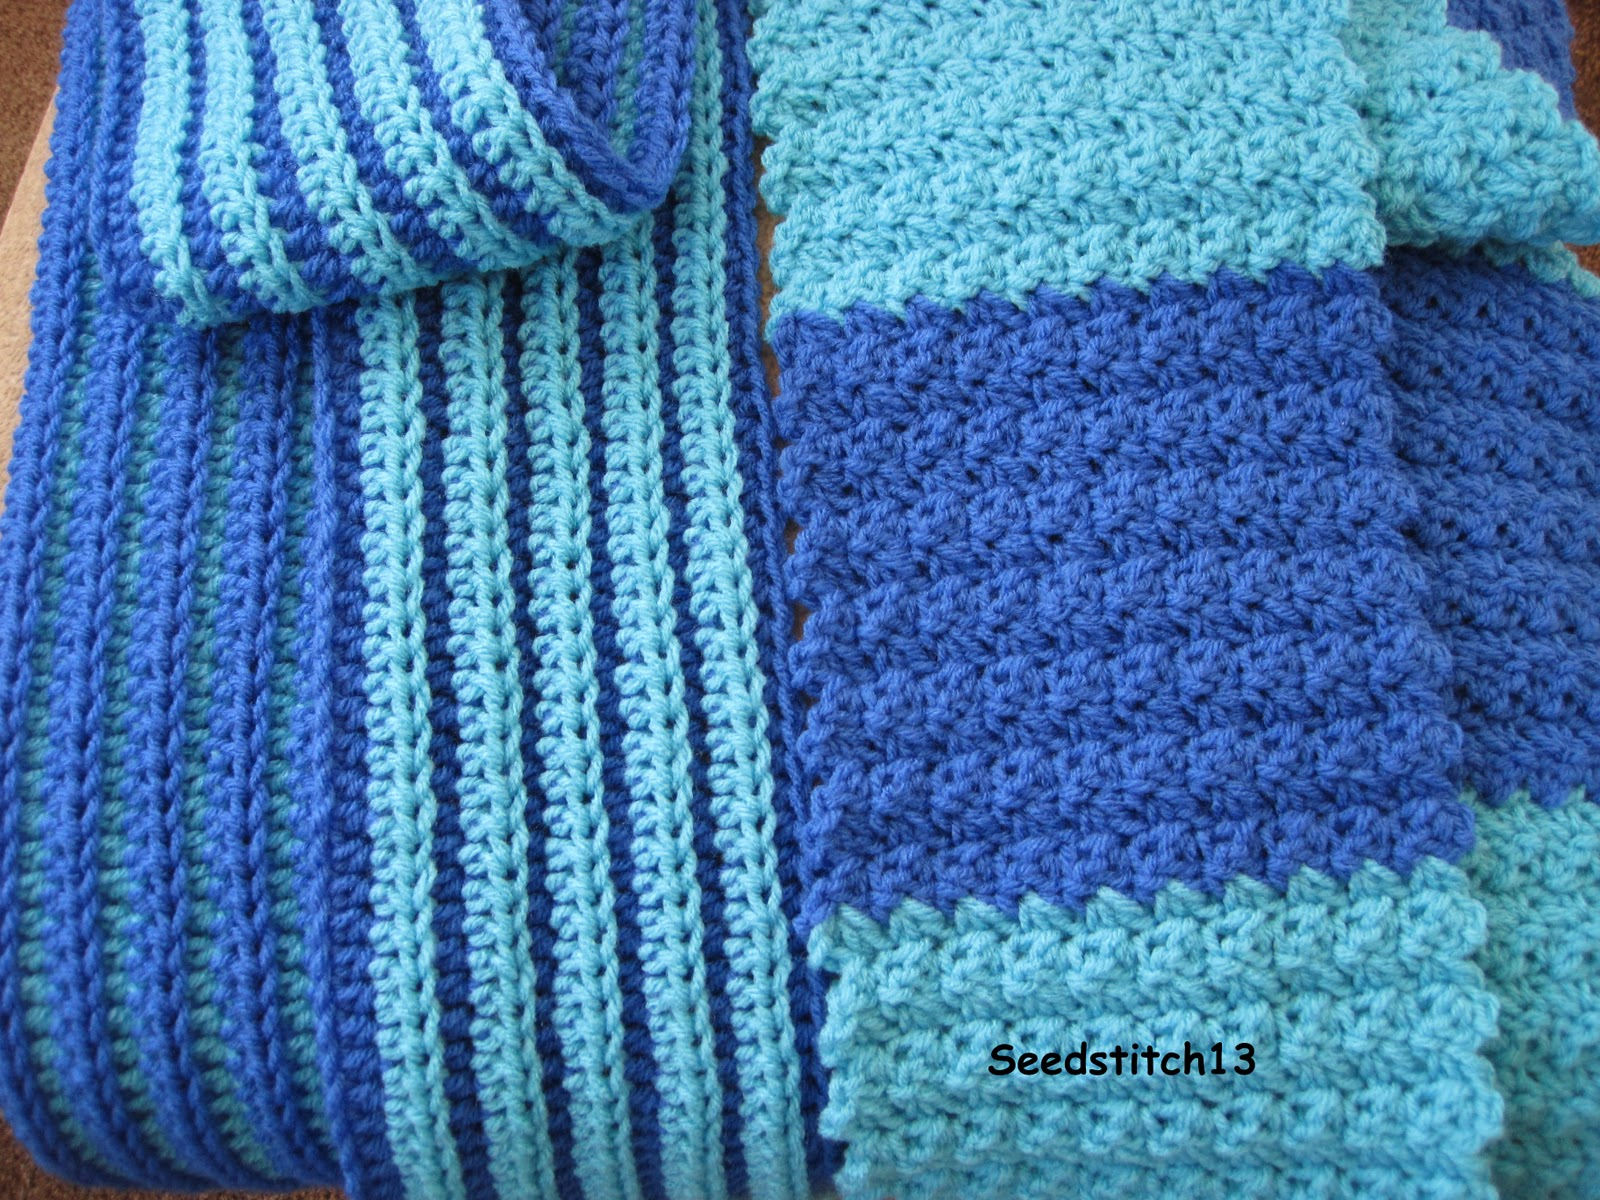 Seedstitch13: Seed Stitch Scarf